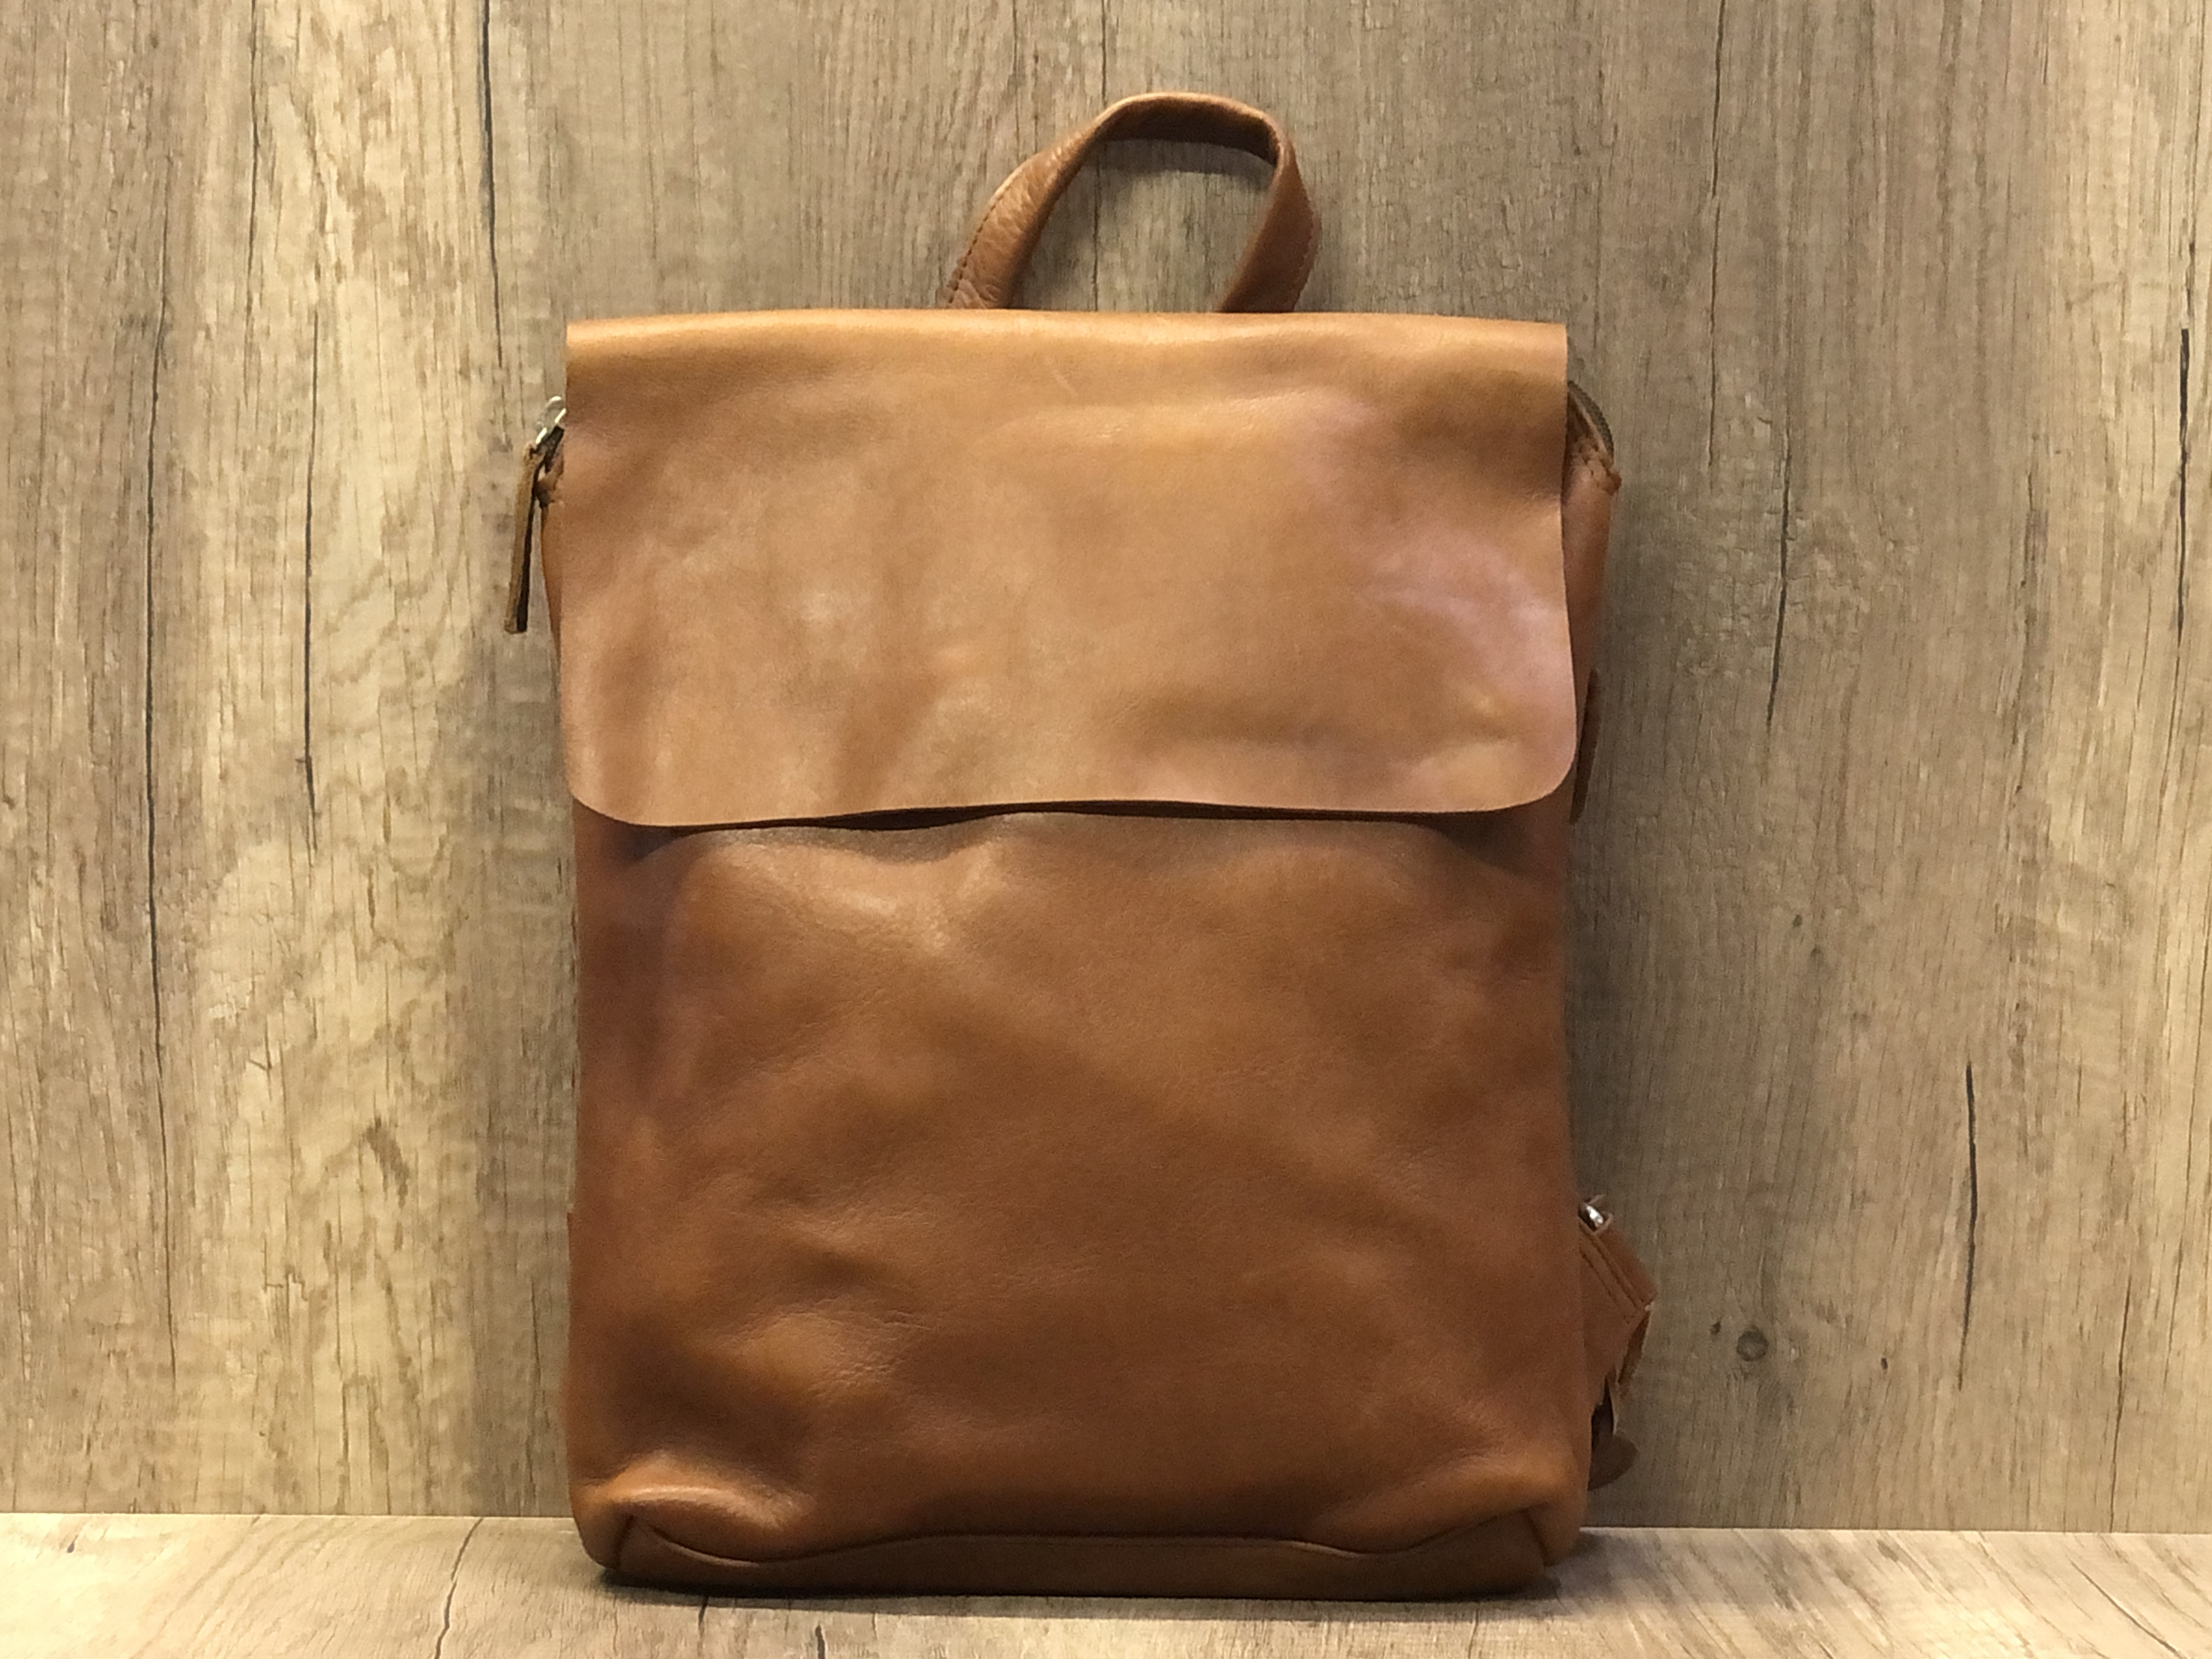 Saccoo-handtassen 14